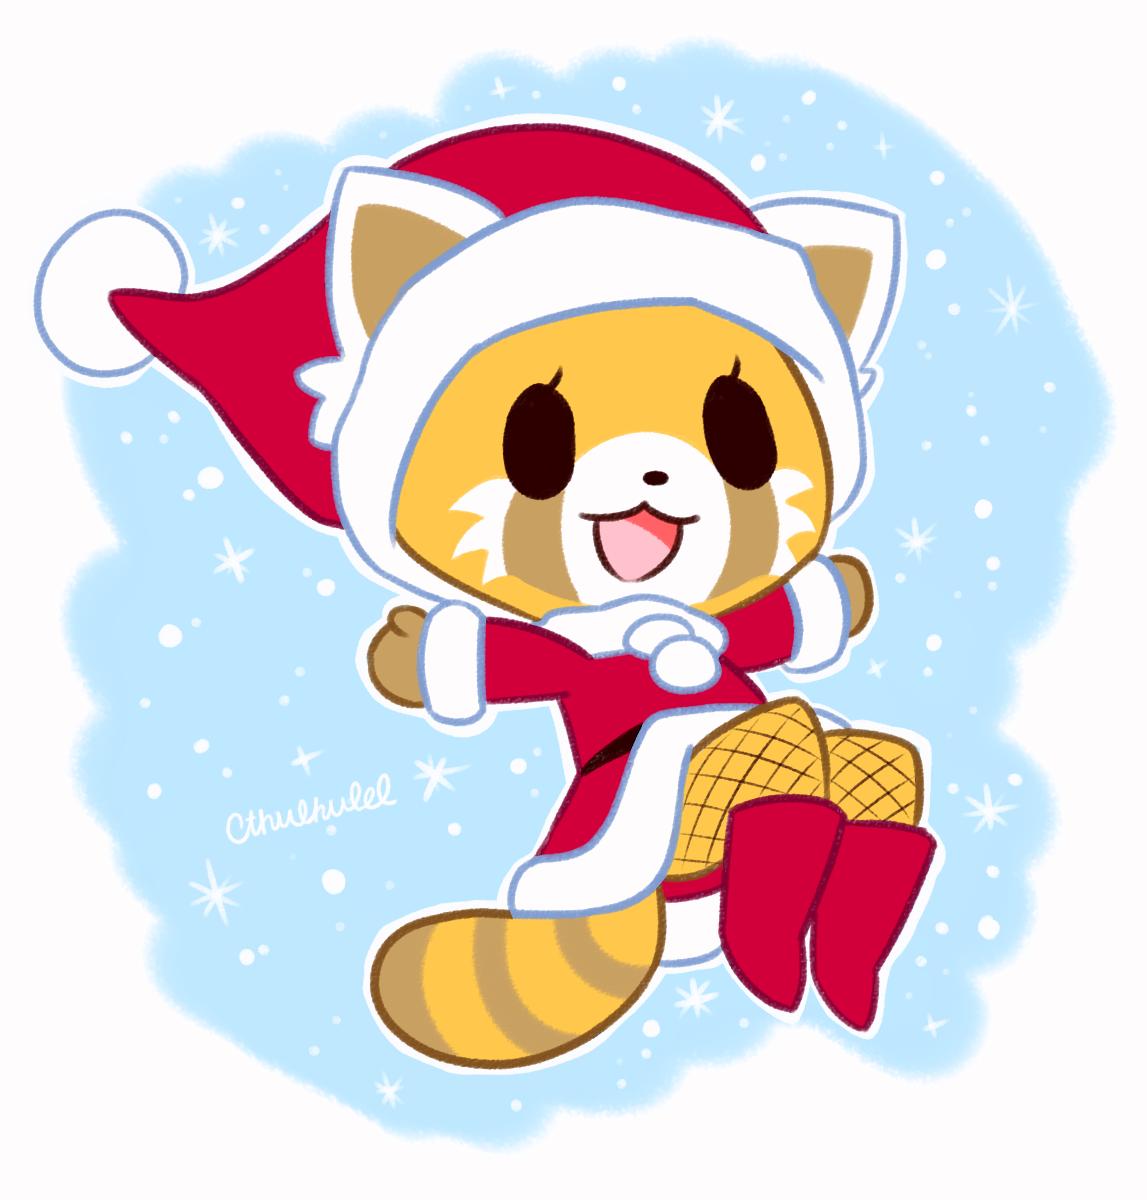 Aggretsuko Christmas.Stacie Is Creating Art Cthulhulel Awesome Anime Kawaii